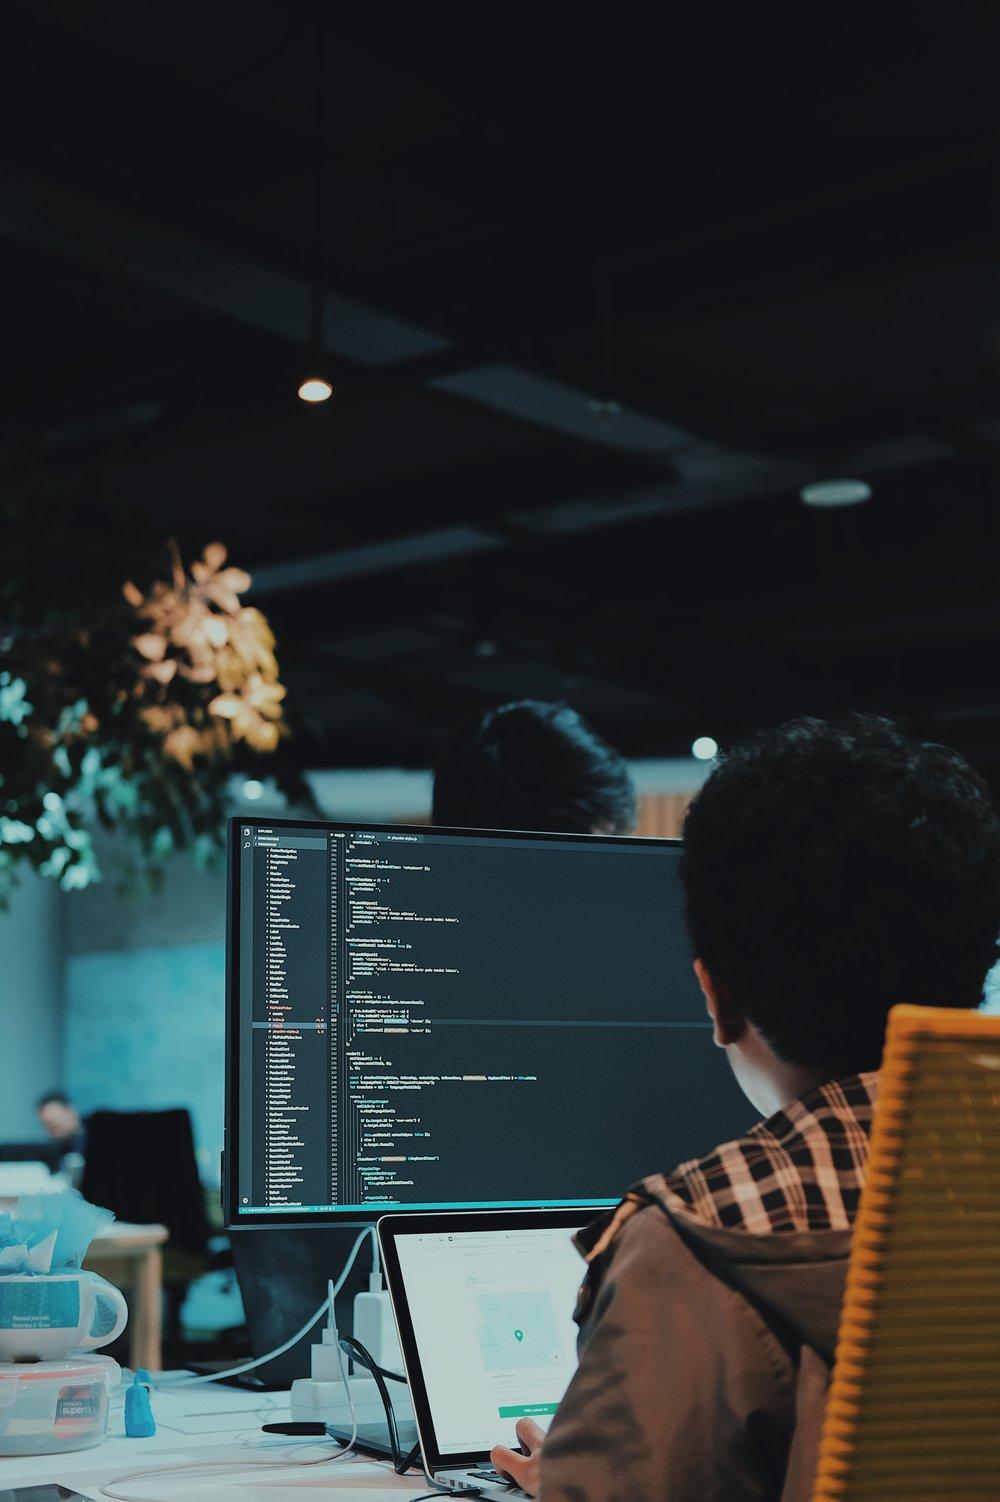 A developer coding a program